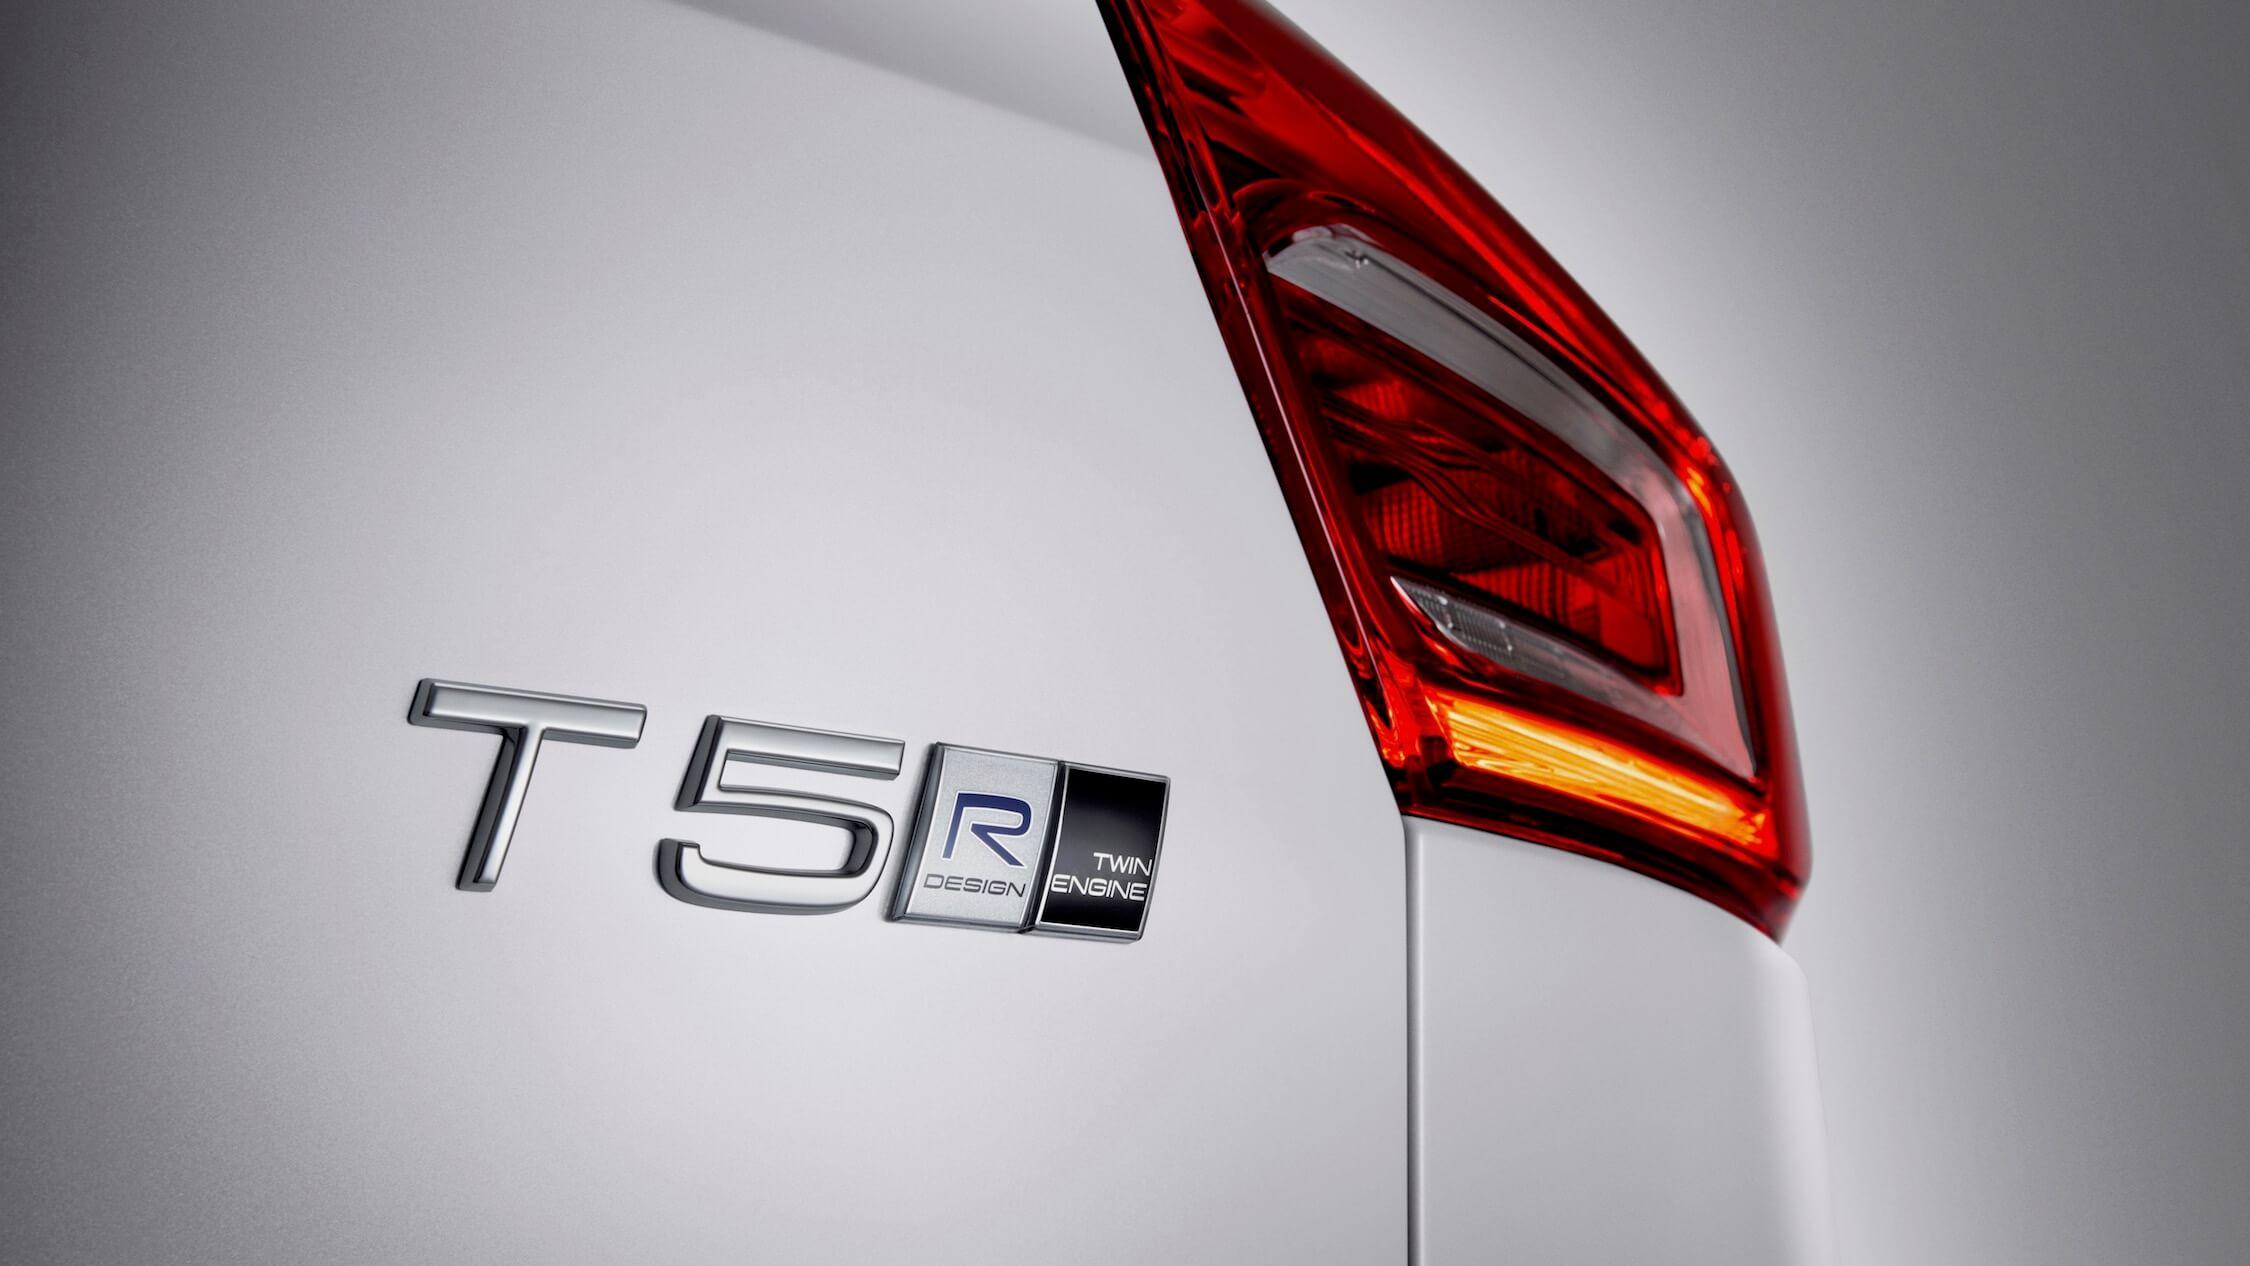 Volvo XC40 T5 logotipo